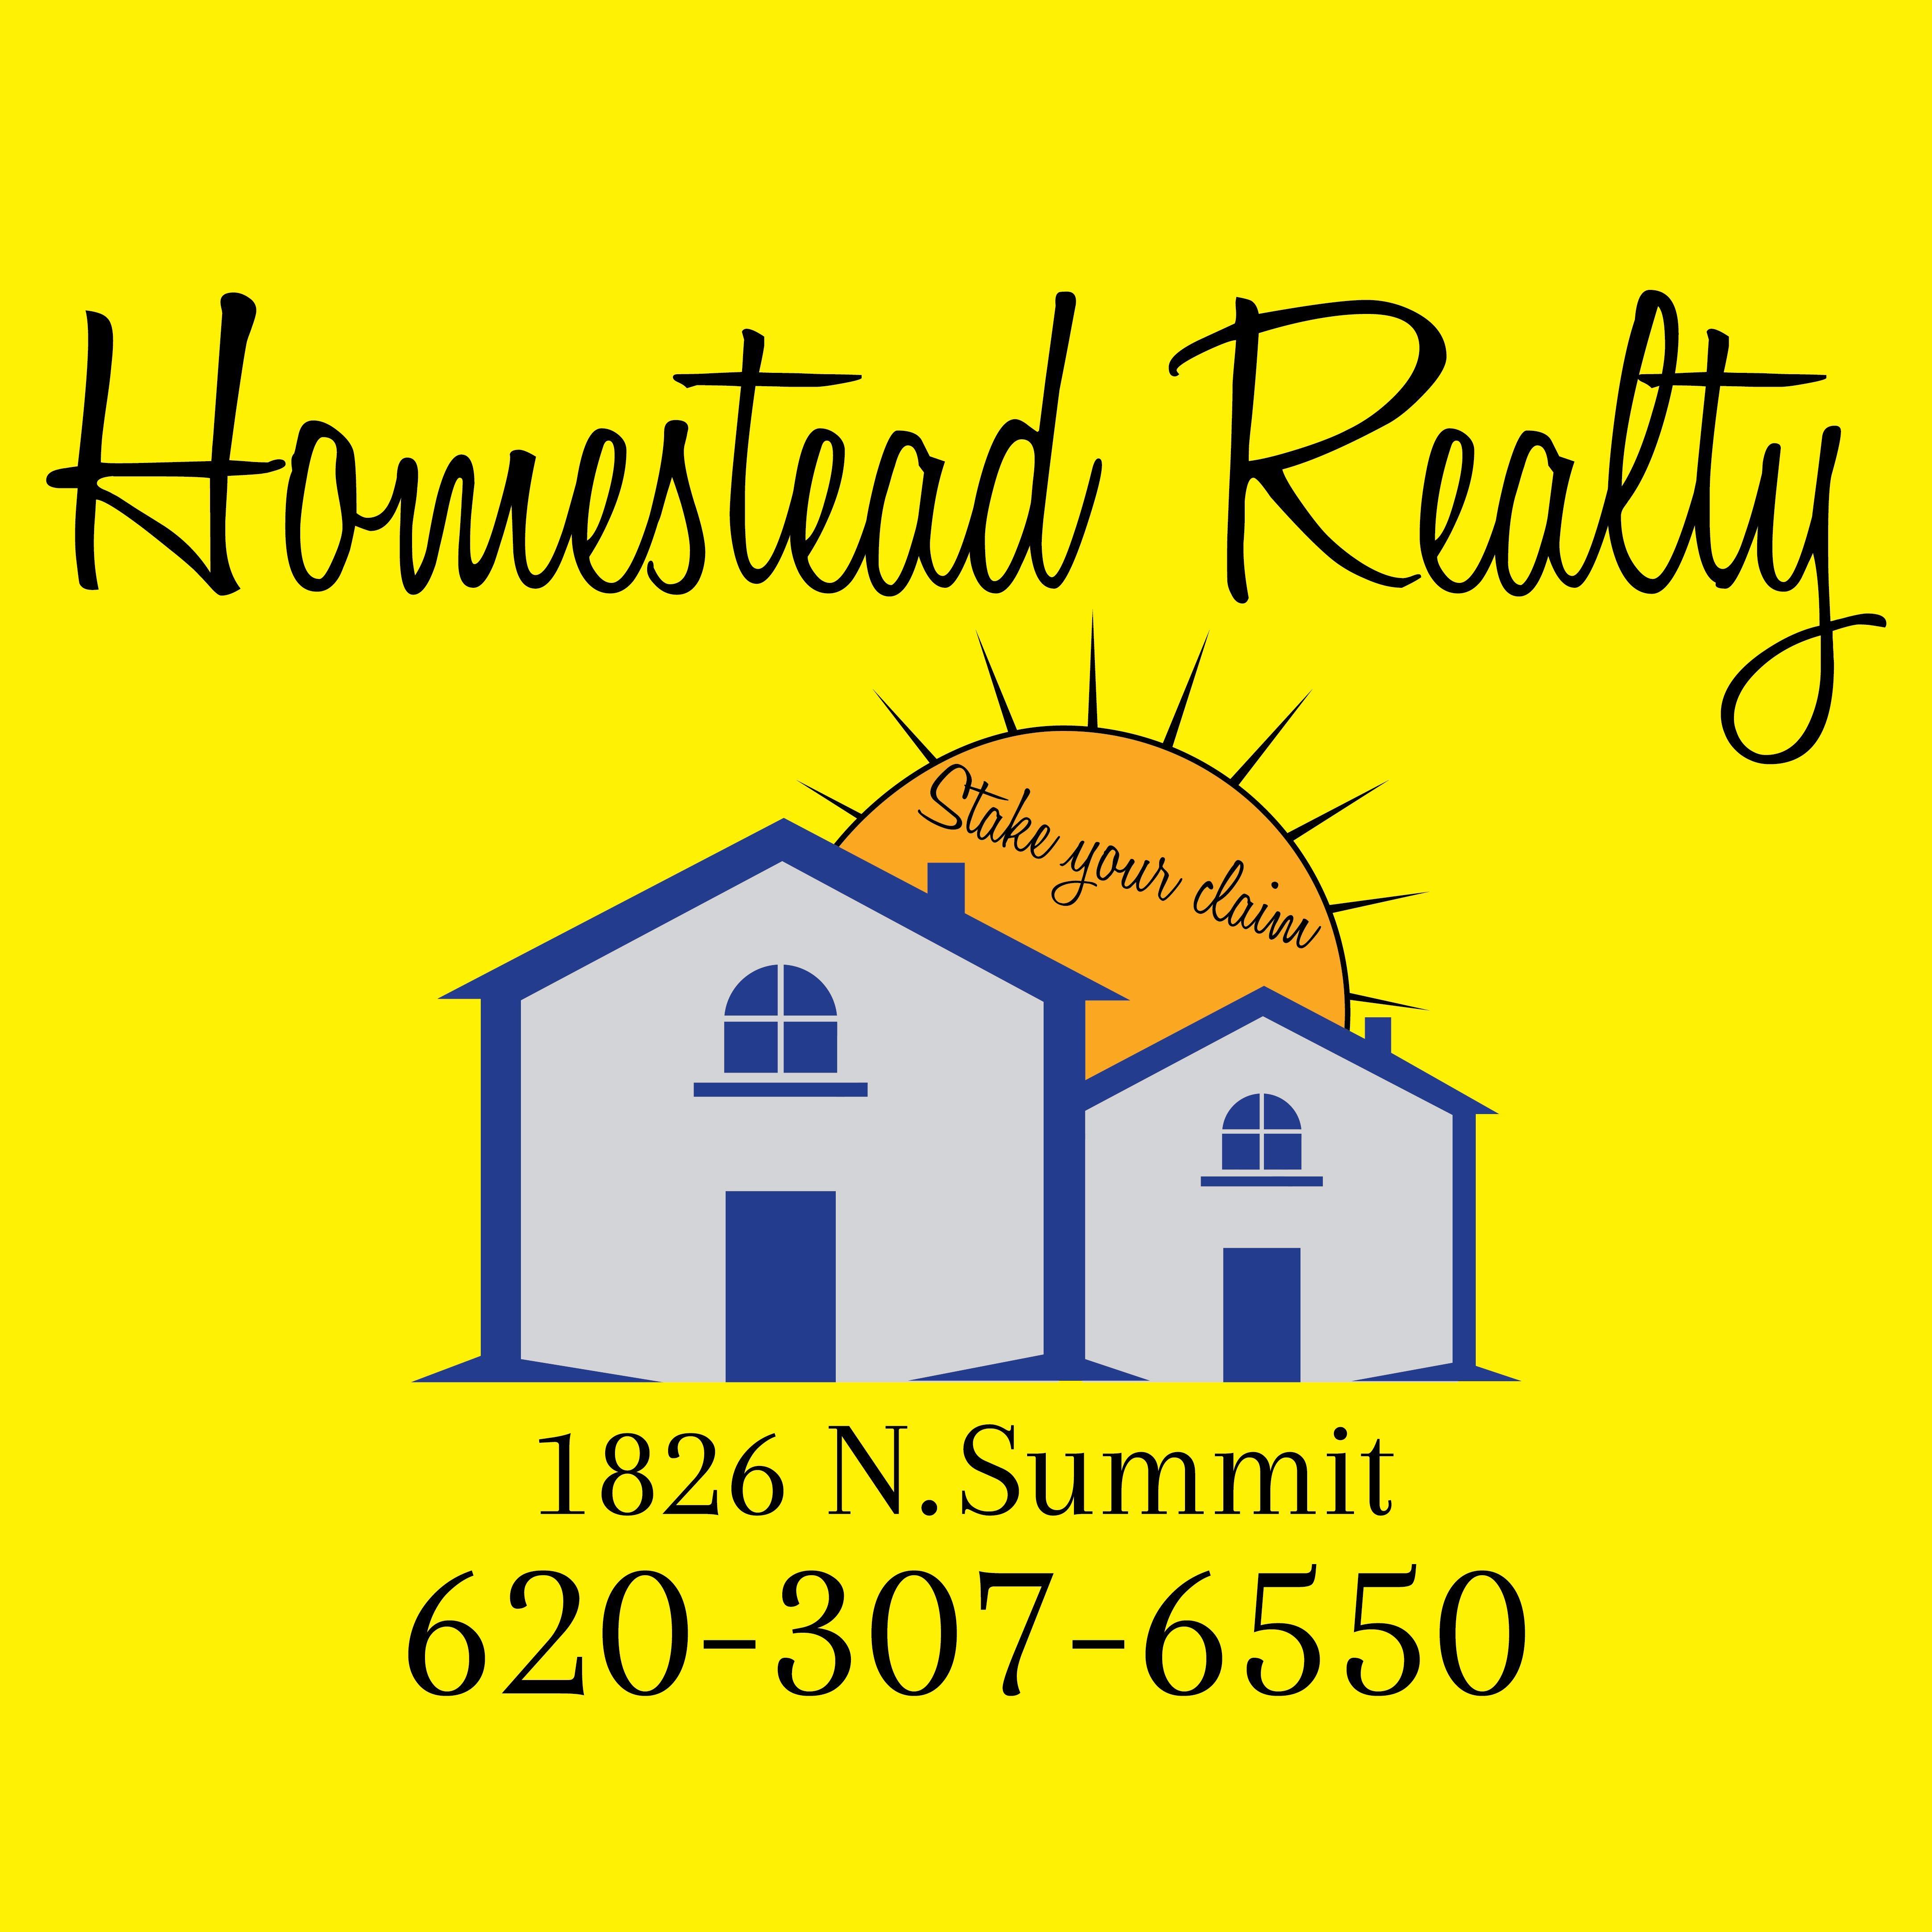 Homestead Realty, LLC image 1